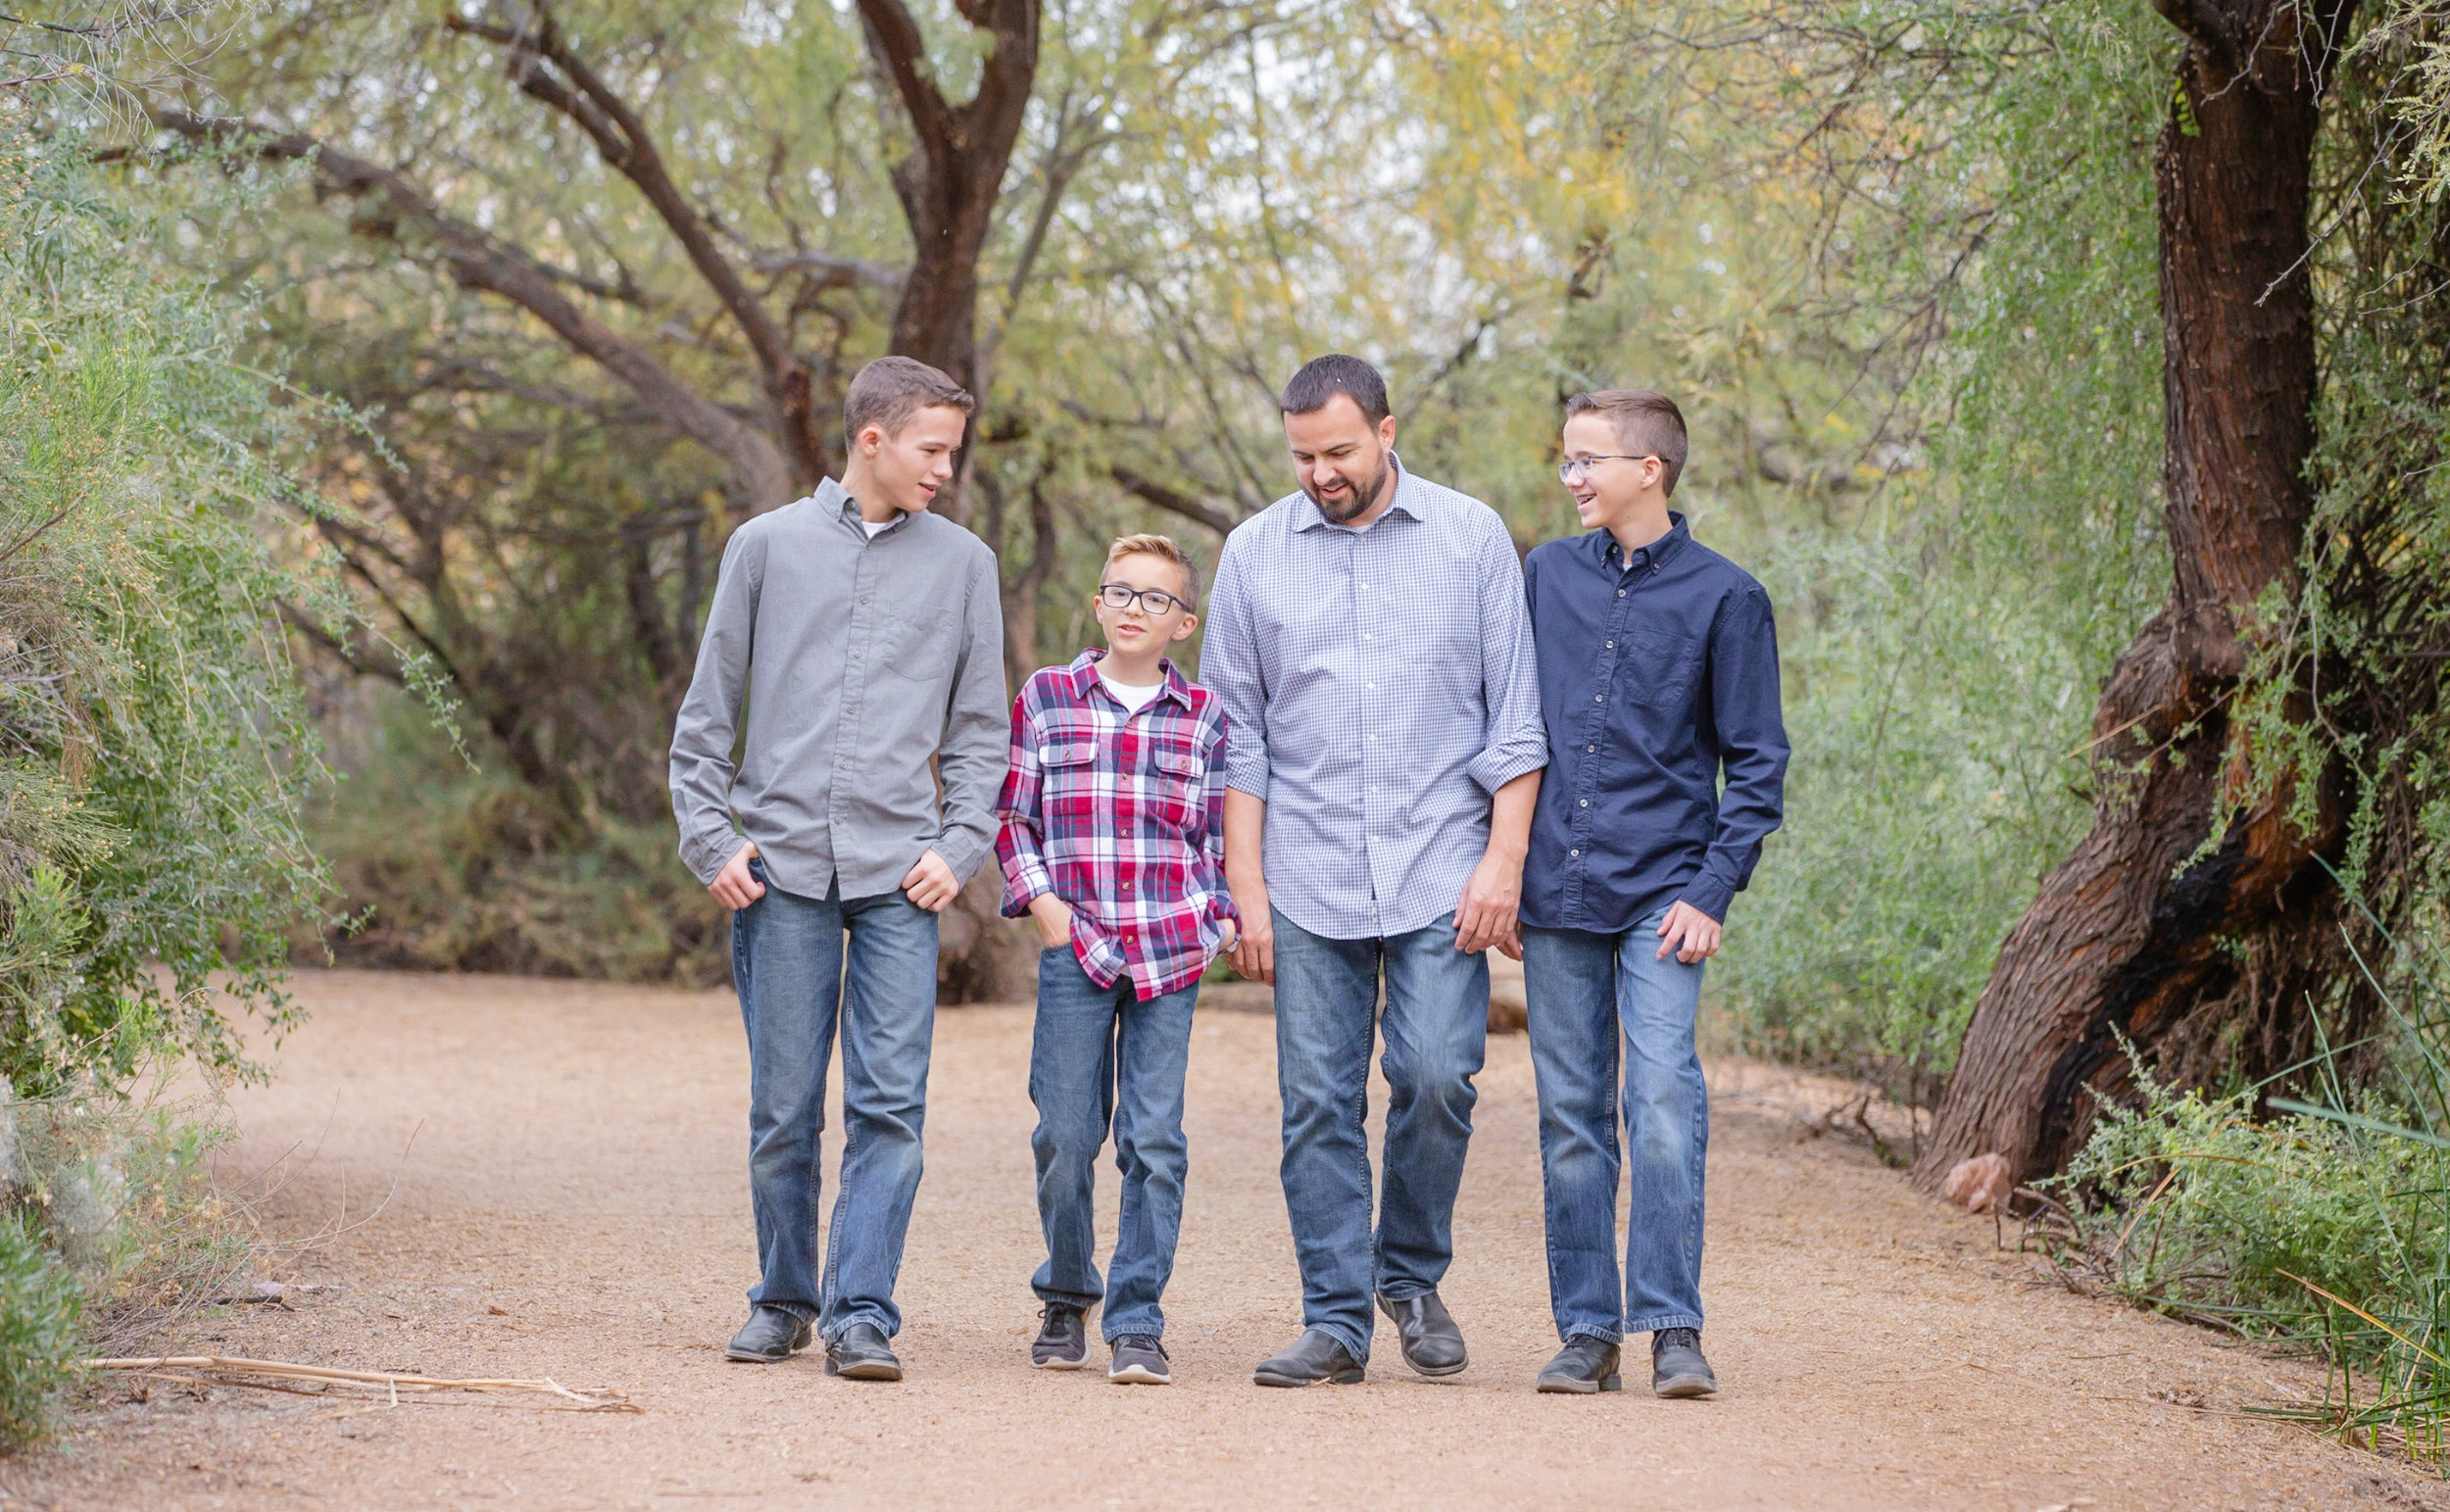 David-Orr-Photography_Dad-Boys-Portraits-web.jpg